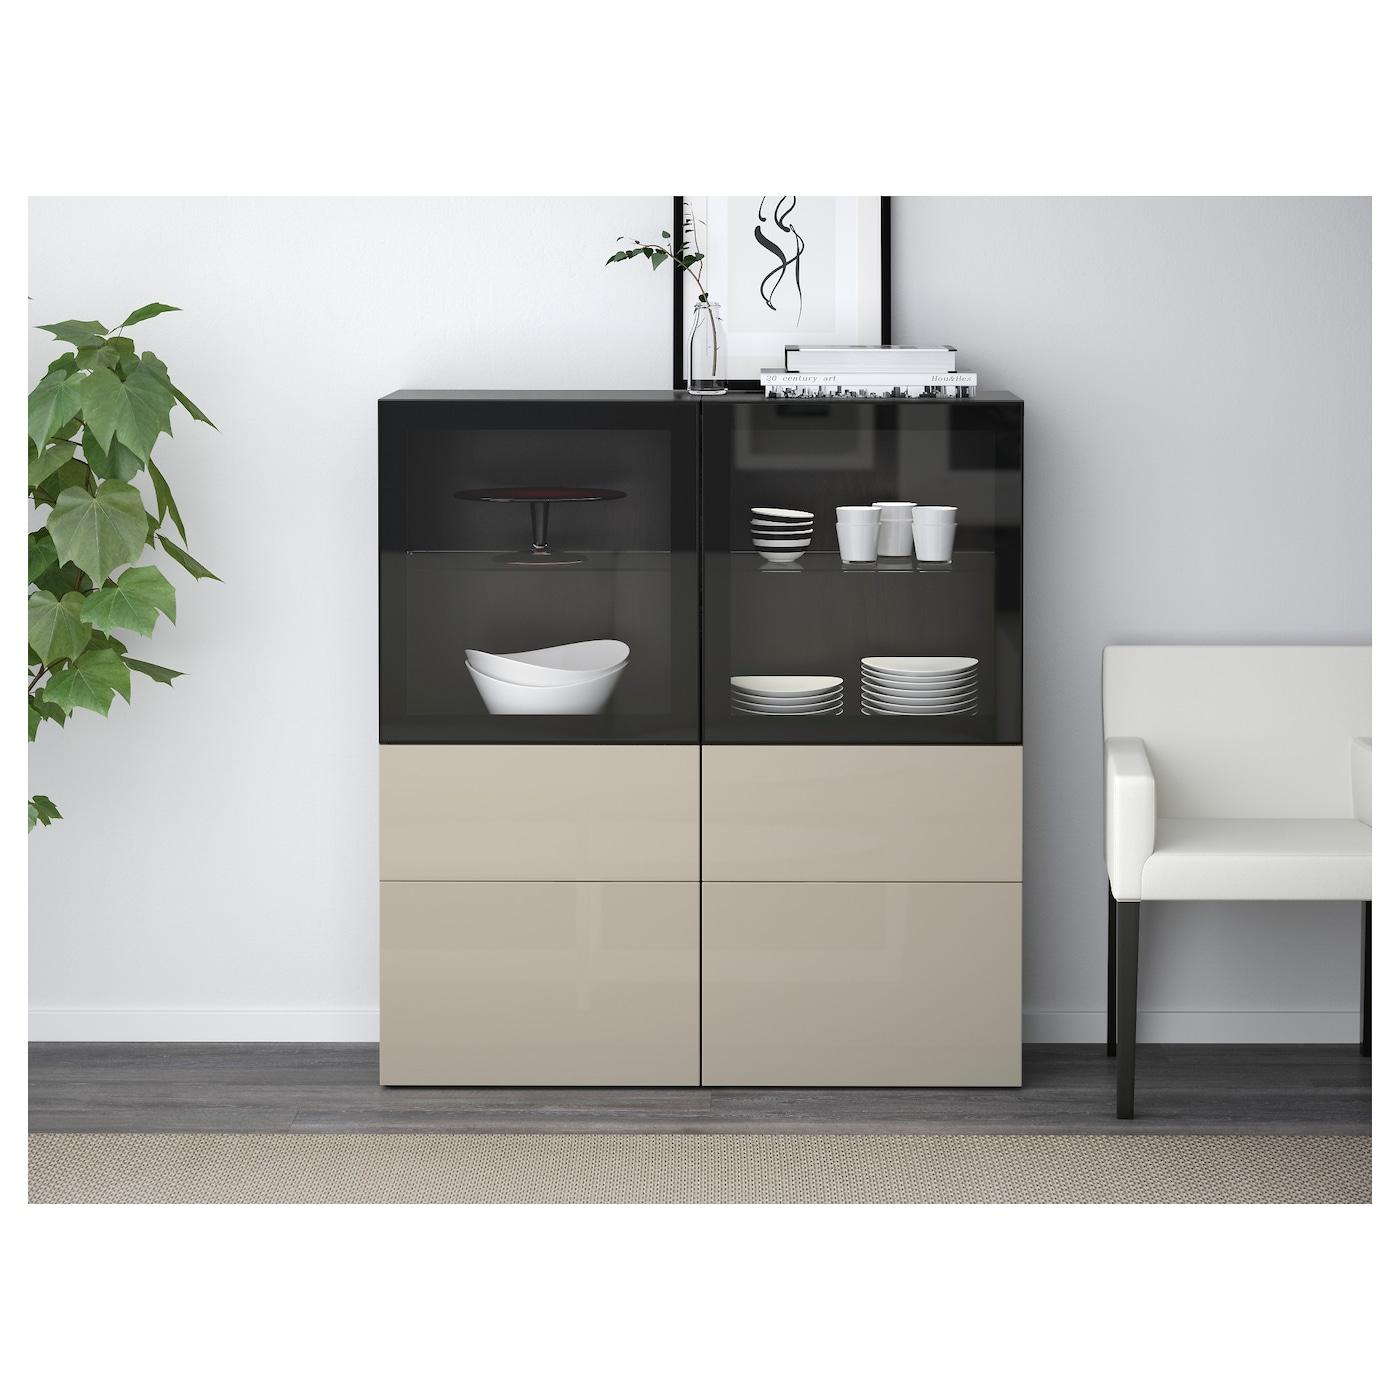 best storage combination w glass doors black brown. Black Bedroom Furniture Sets. Home Design Ideas